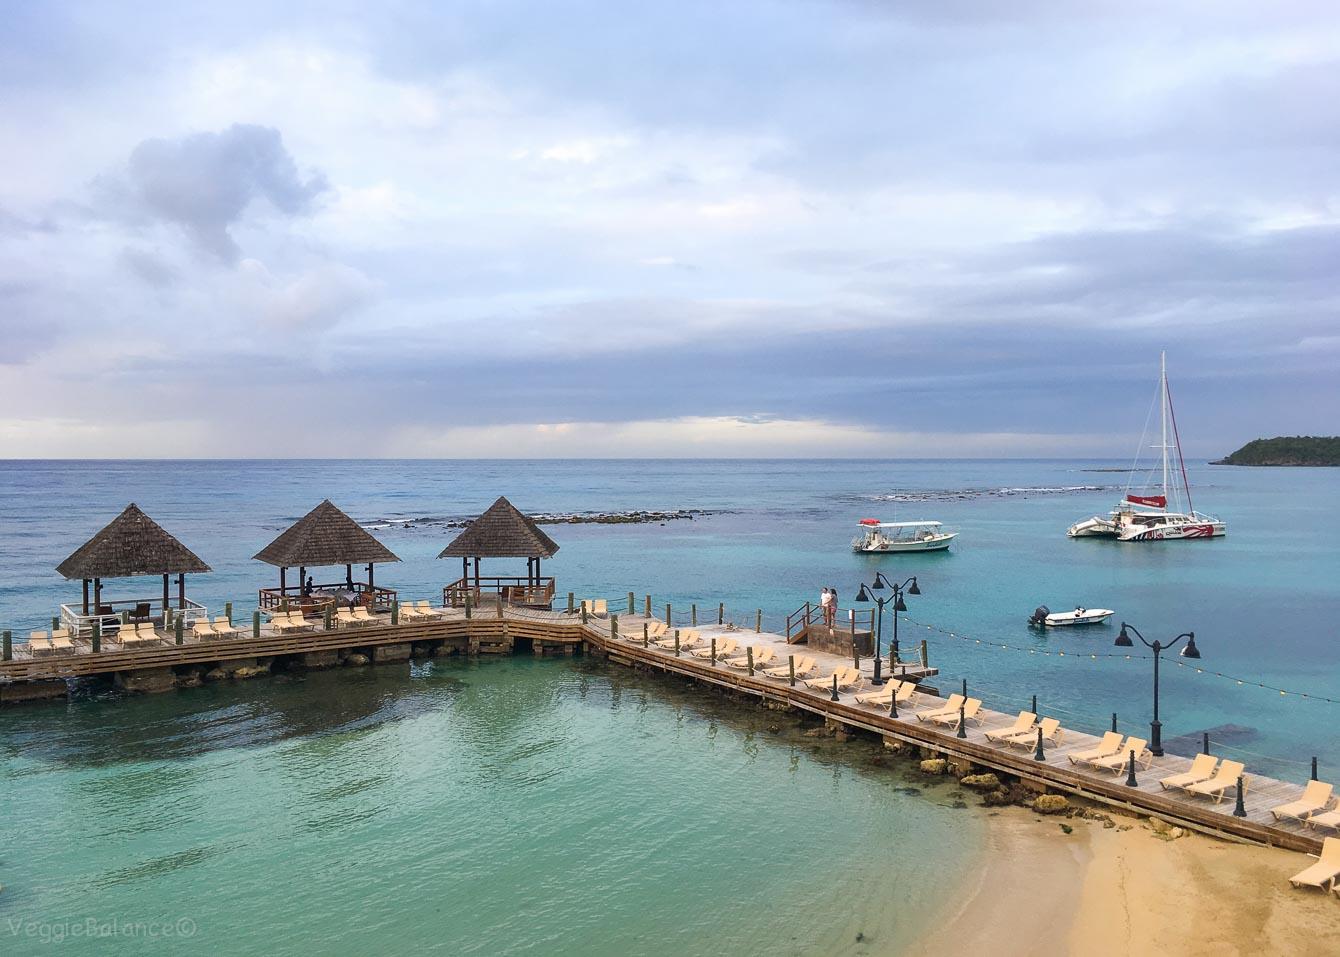 All-inclusive resort stay sans allergens - Veggiebalance.com